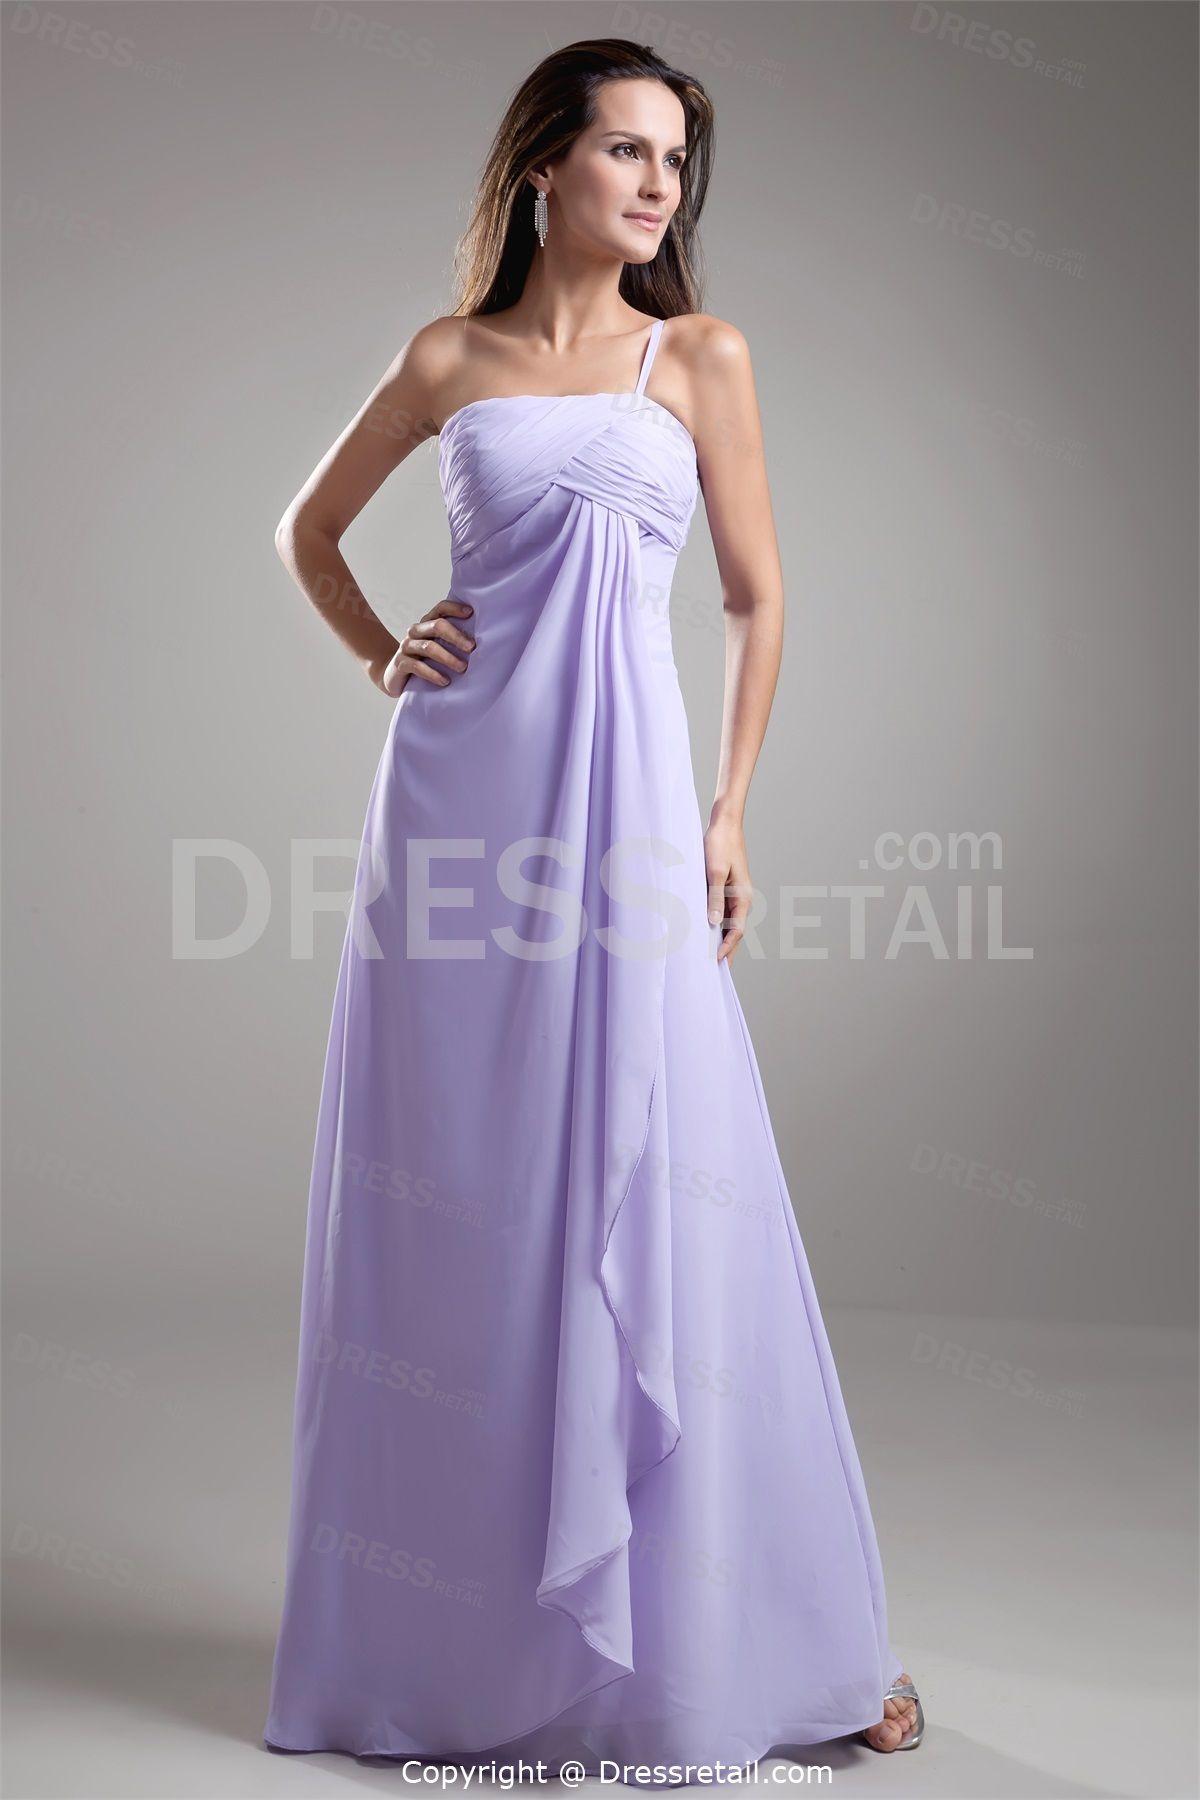 One strap wedding dress  Lavender Chiffon Bridesmaid Dresses   Dresses ueLavender Chiffon